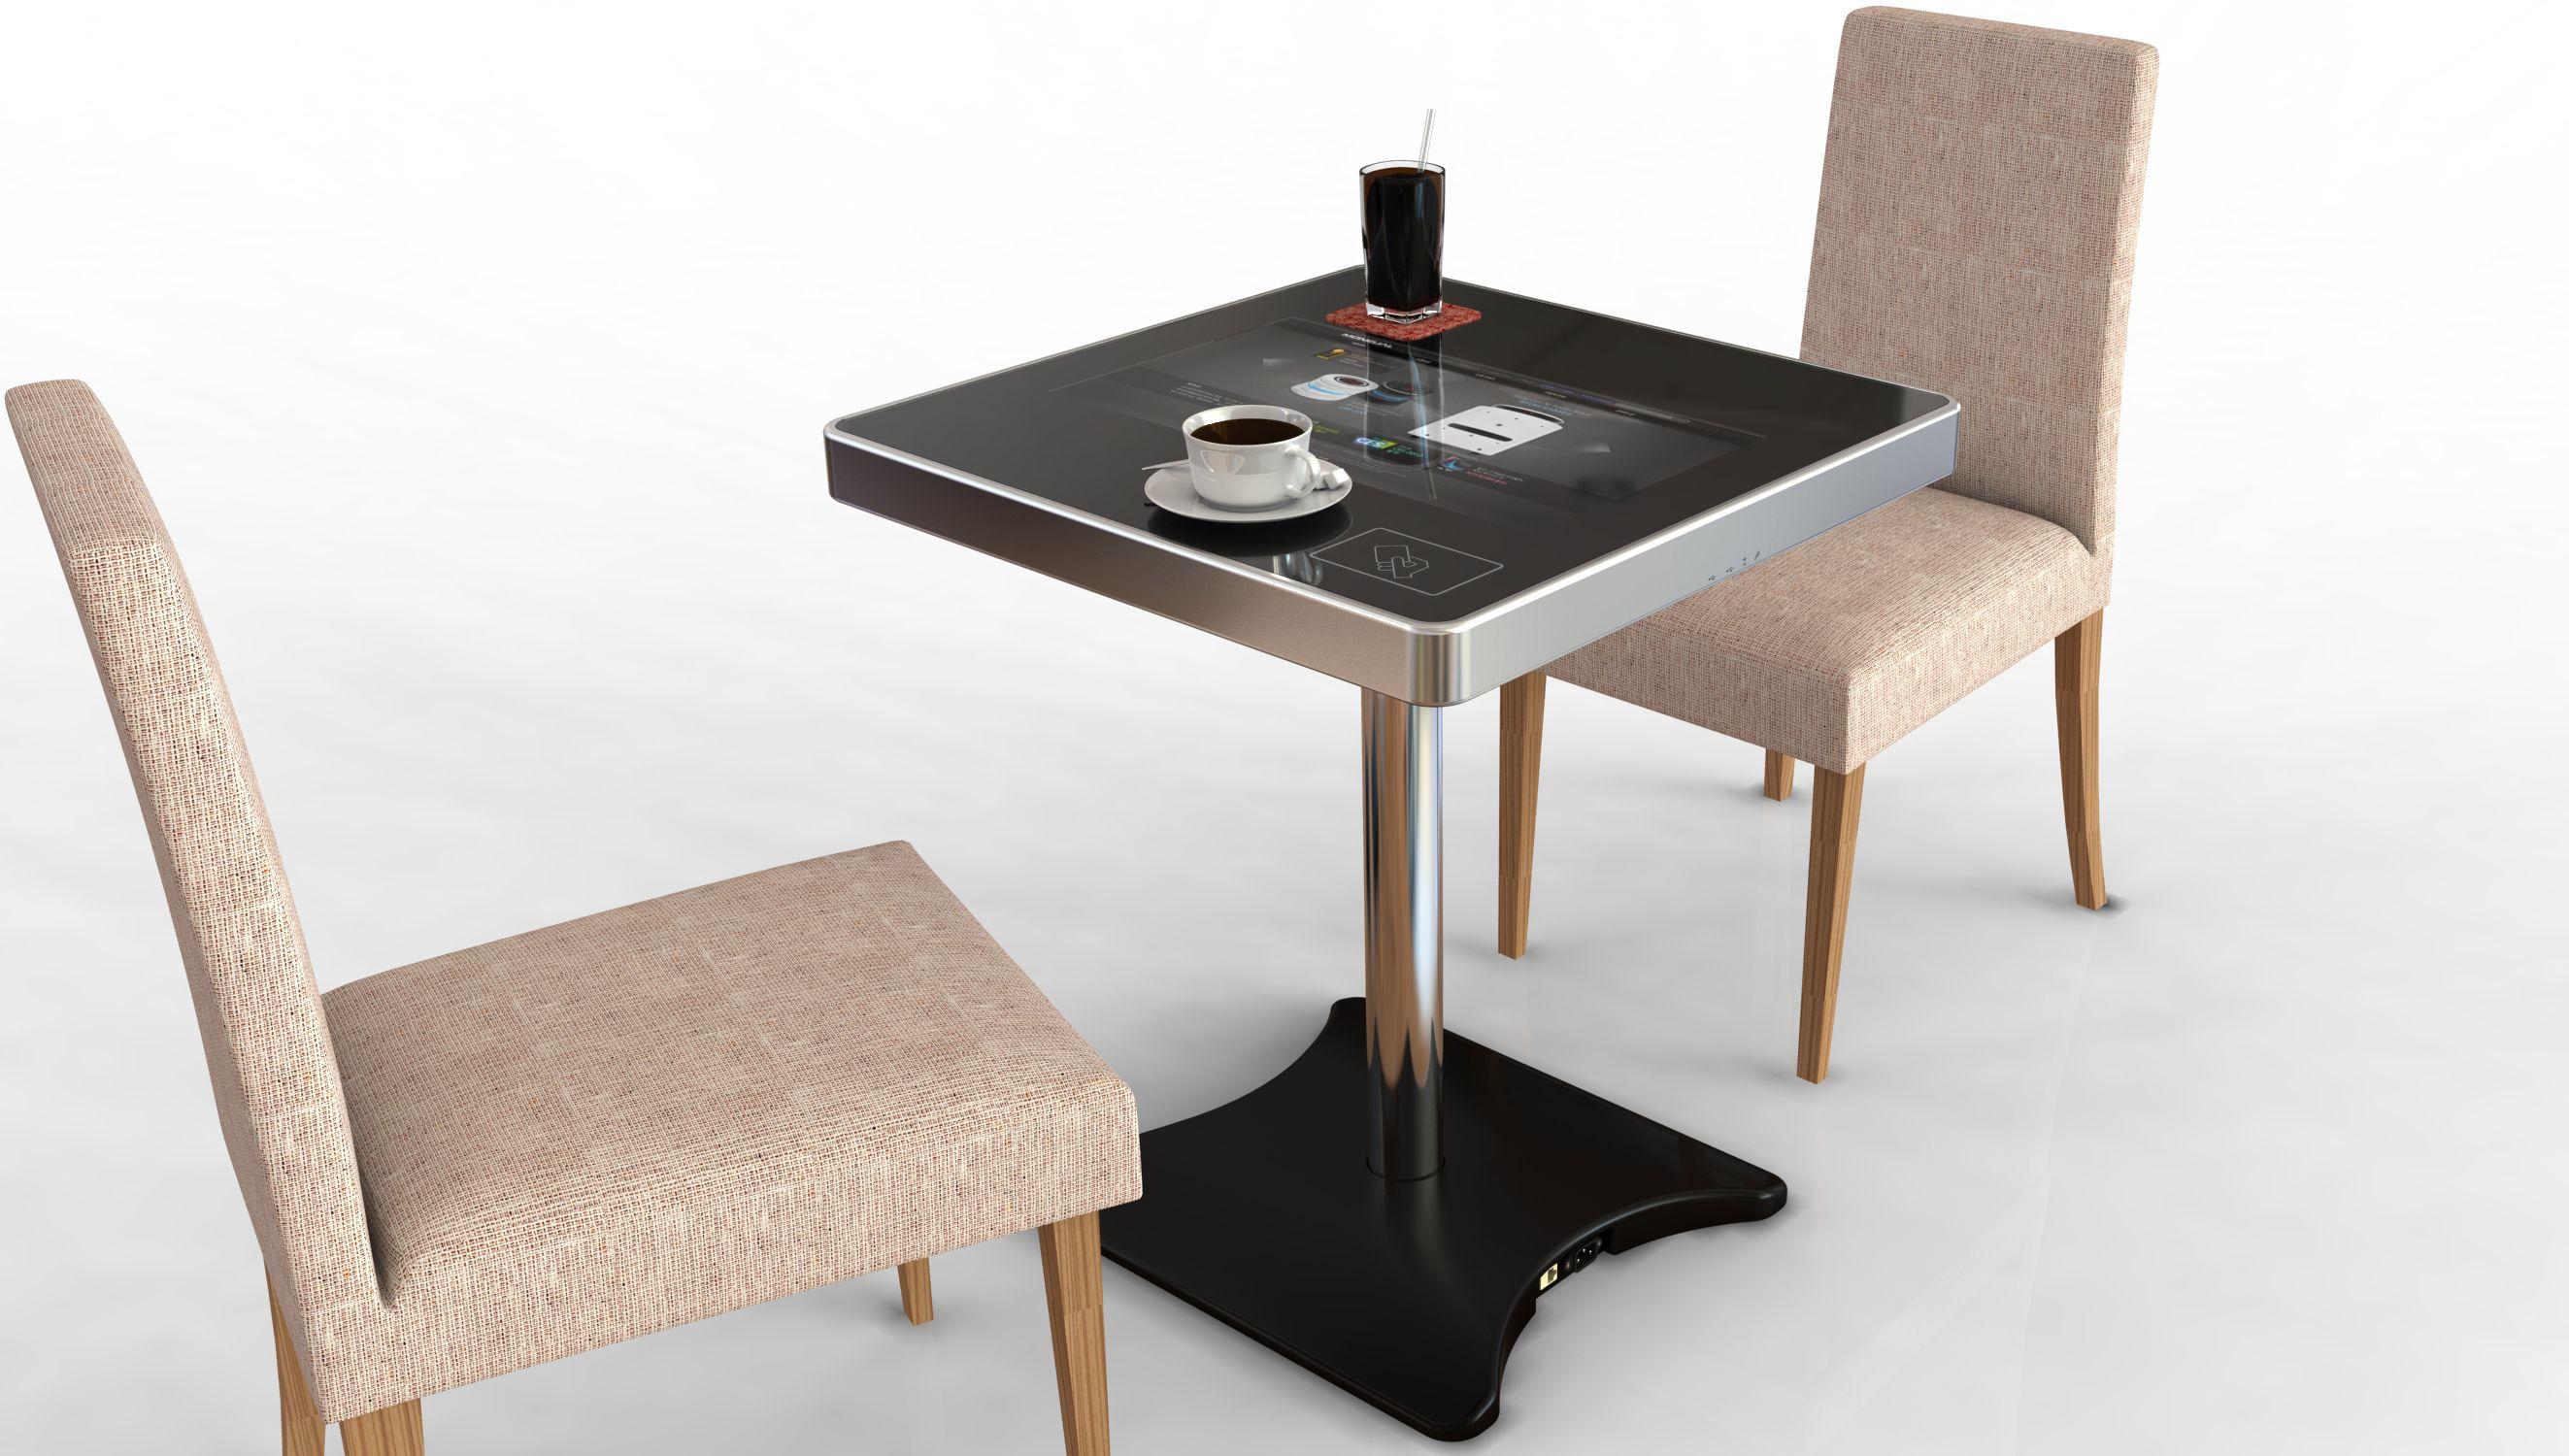 1-table-pc-ART(1)_1.jpg 2,646×1,500 pixels